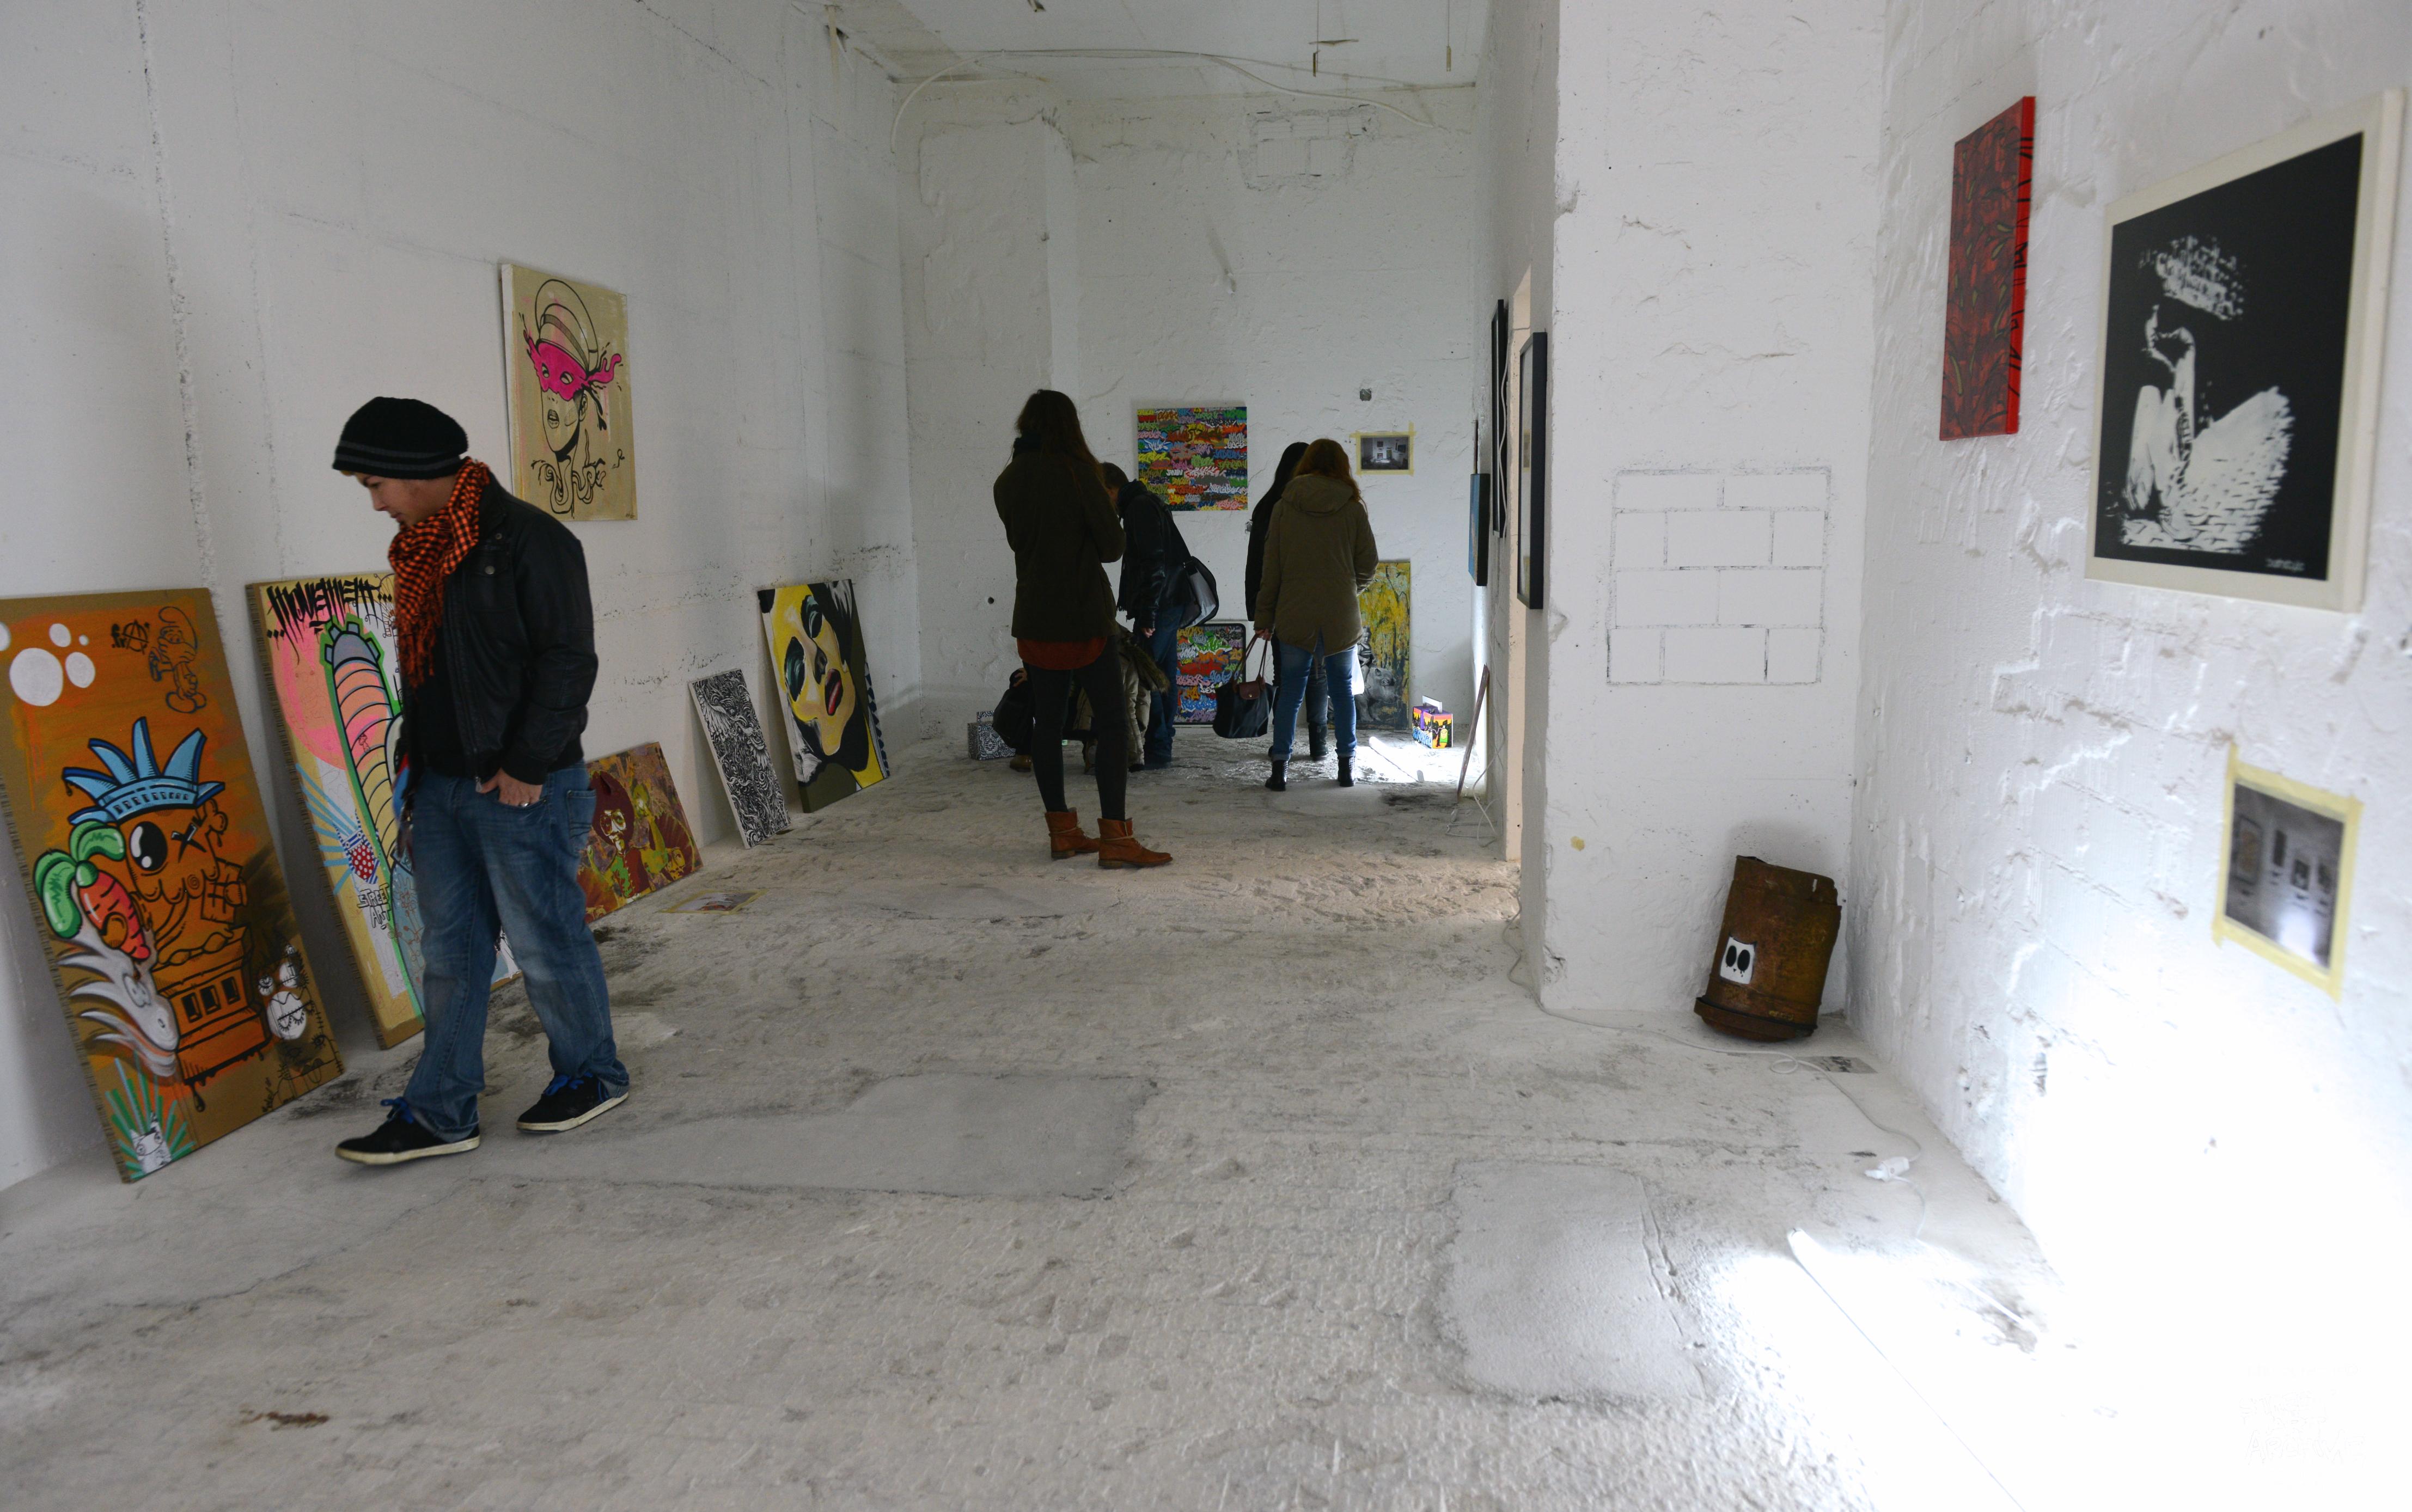 streetartlimited-2014-11-22 (43).jpg